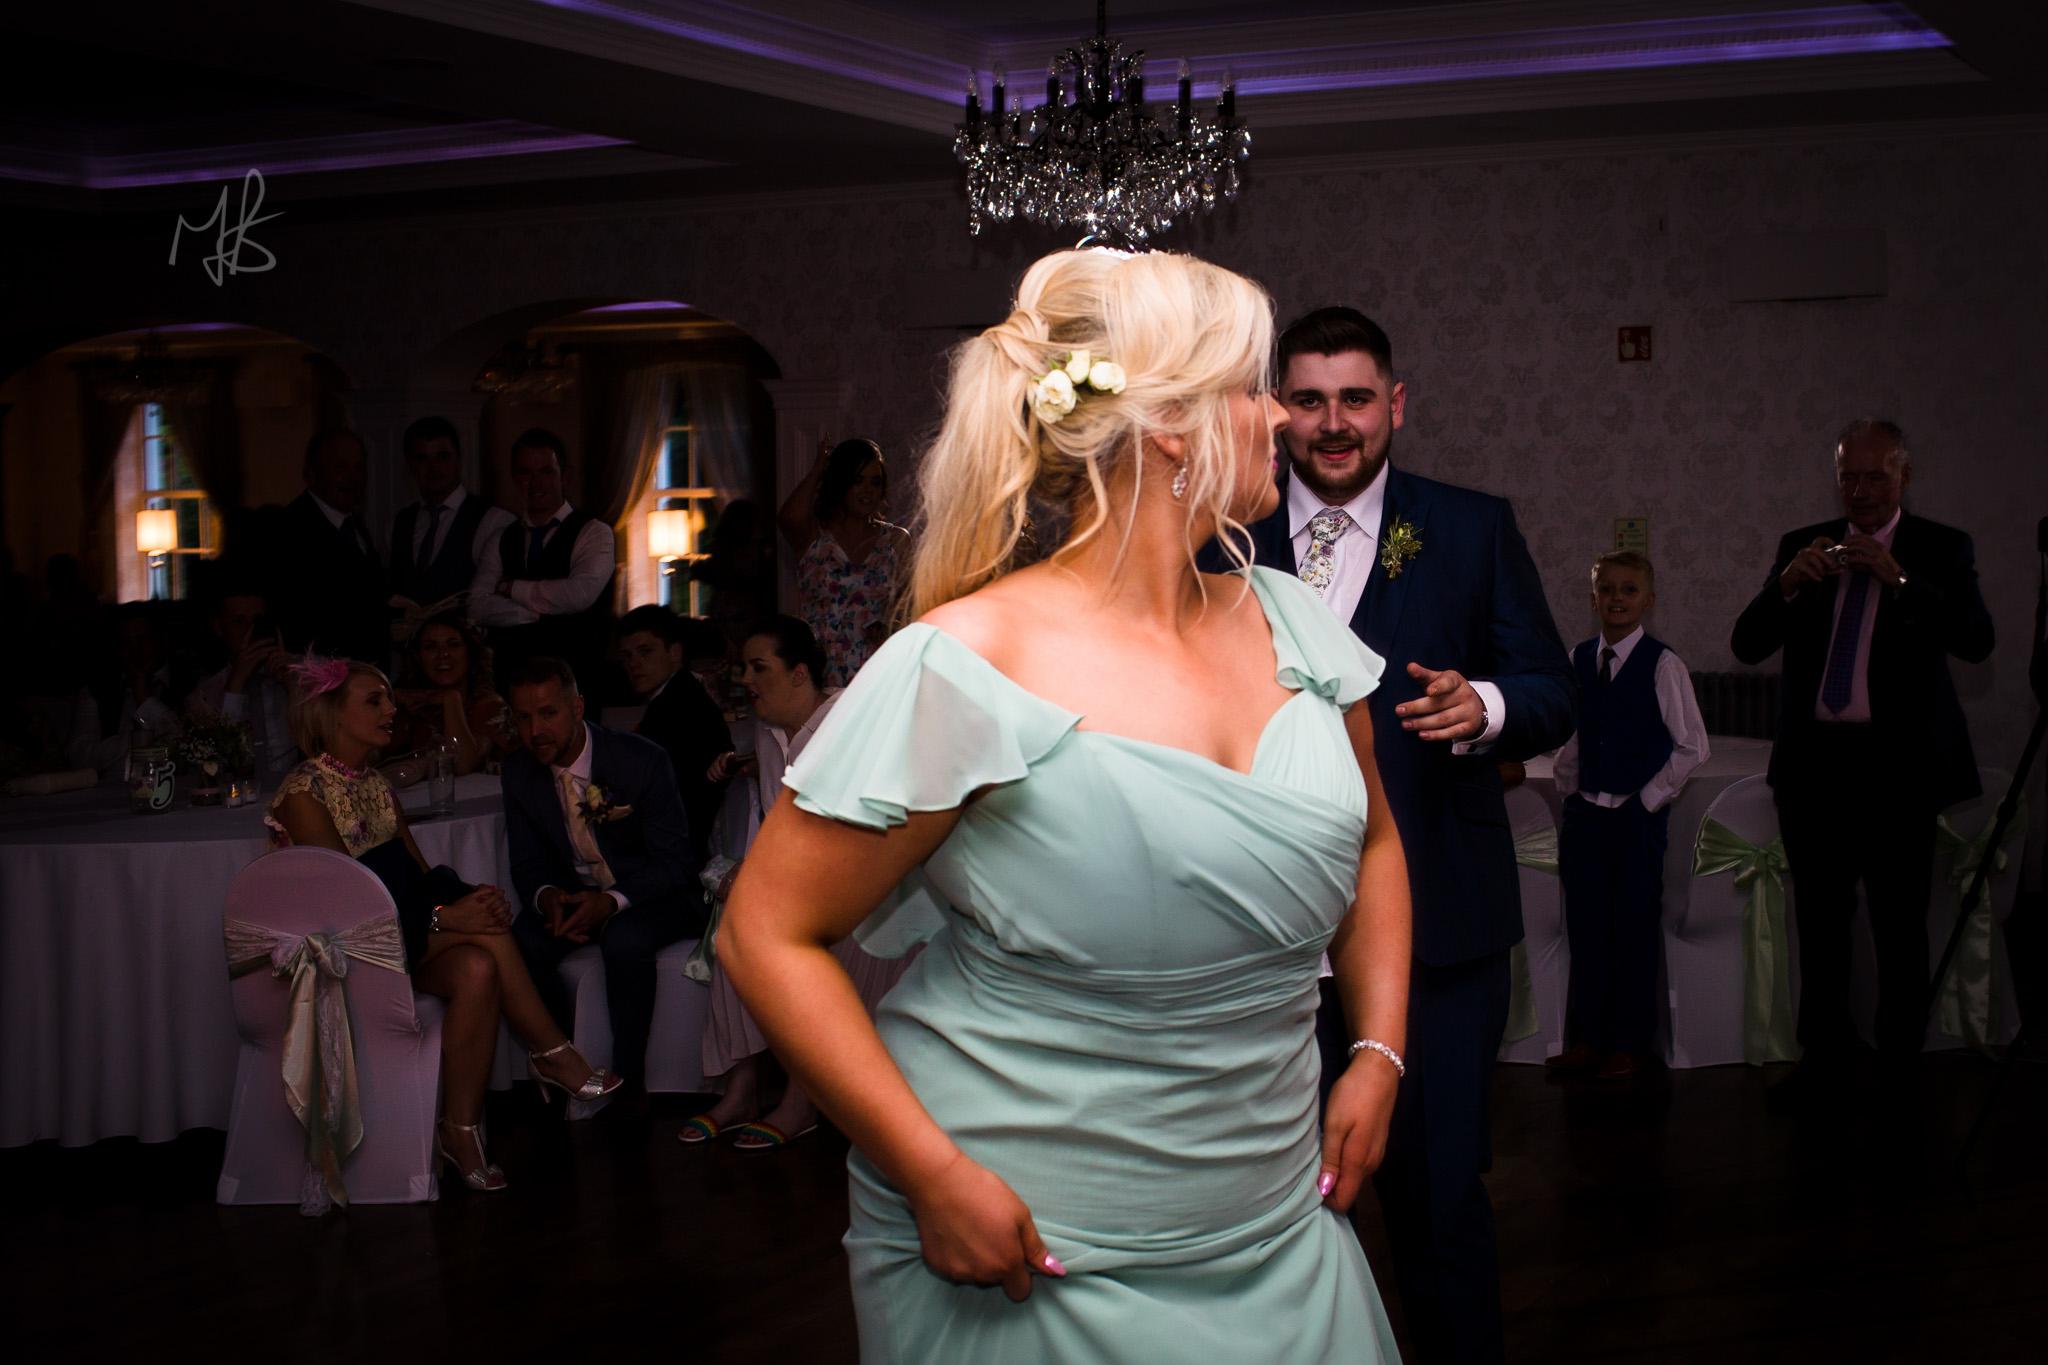 Northern-Ireland-Wedding-Photographer-Mark-Barnes-Ballymena_wedding-photography-Leighinmohr-House-Seamas_Alanna_For-web-54.jpg